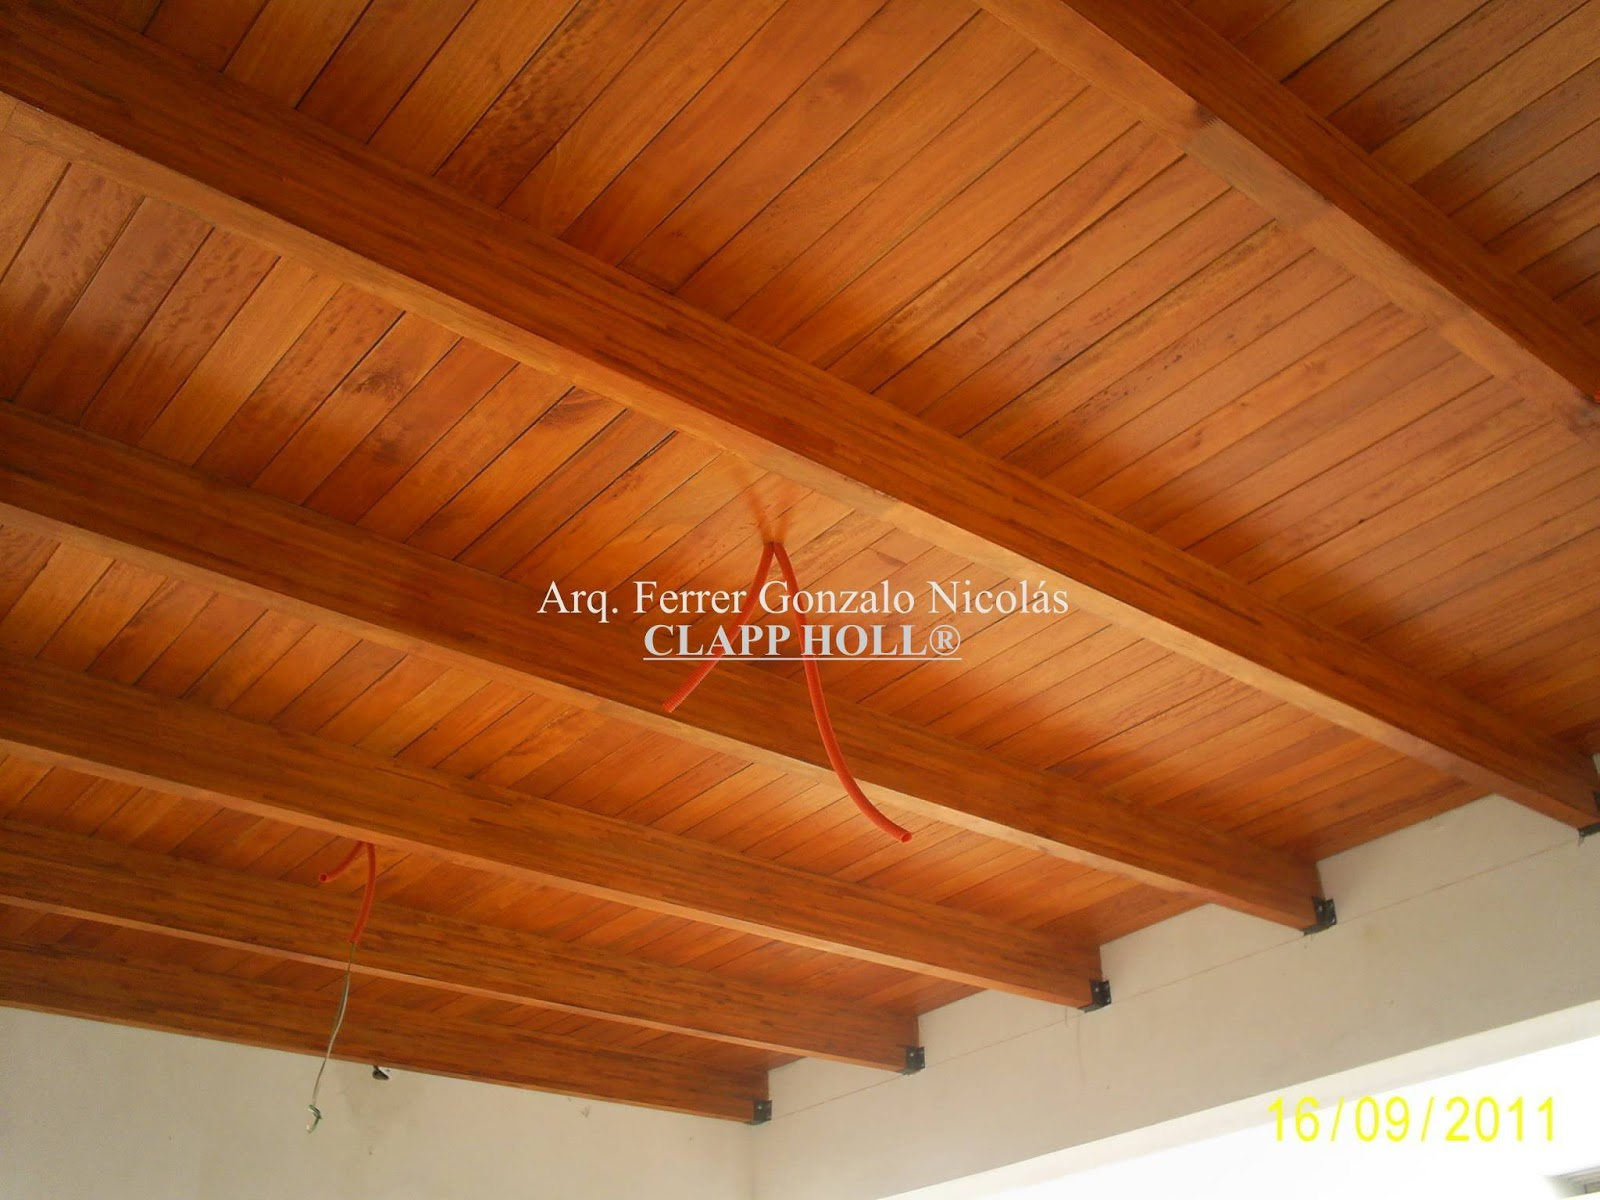 Techos de madera clapp holl cordoba for Pisos para techos de madera